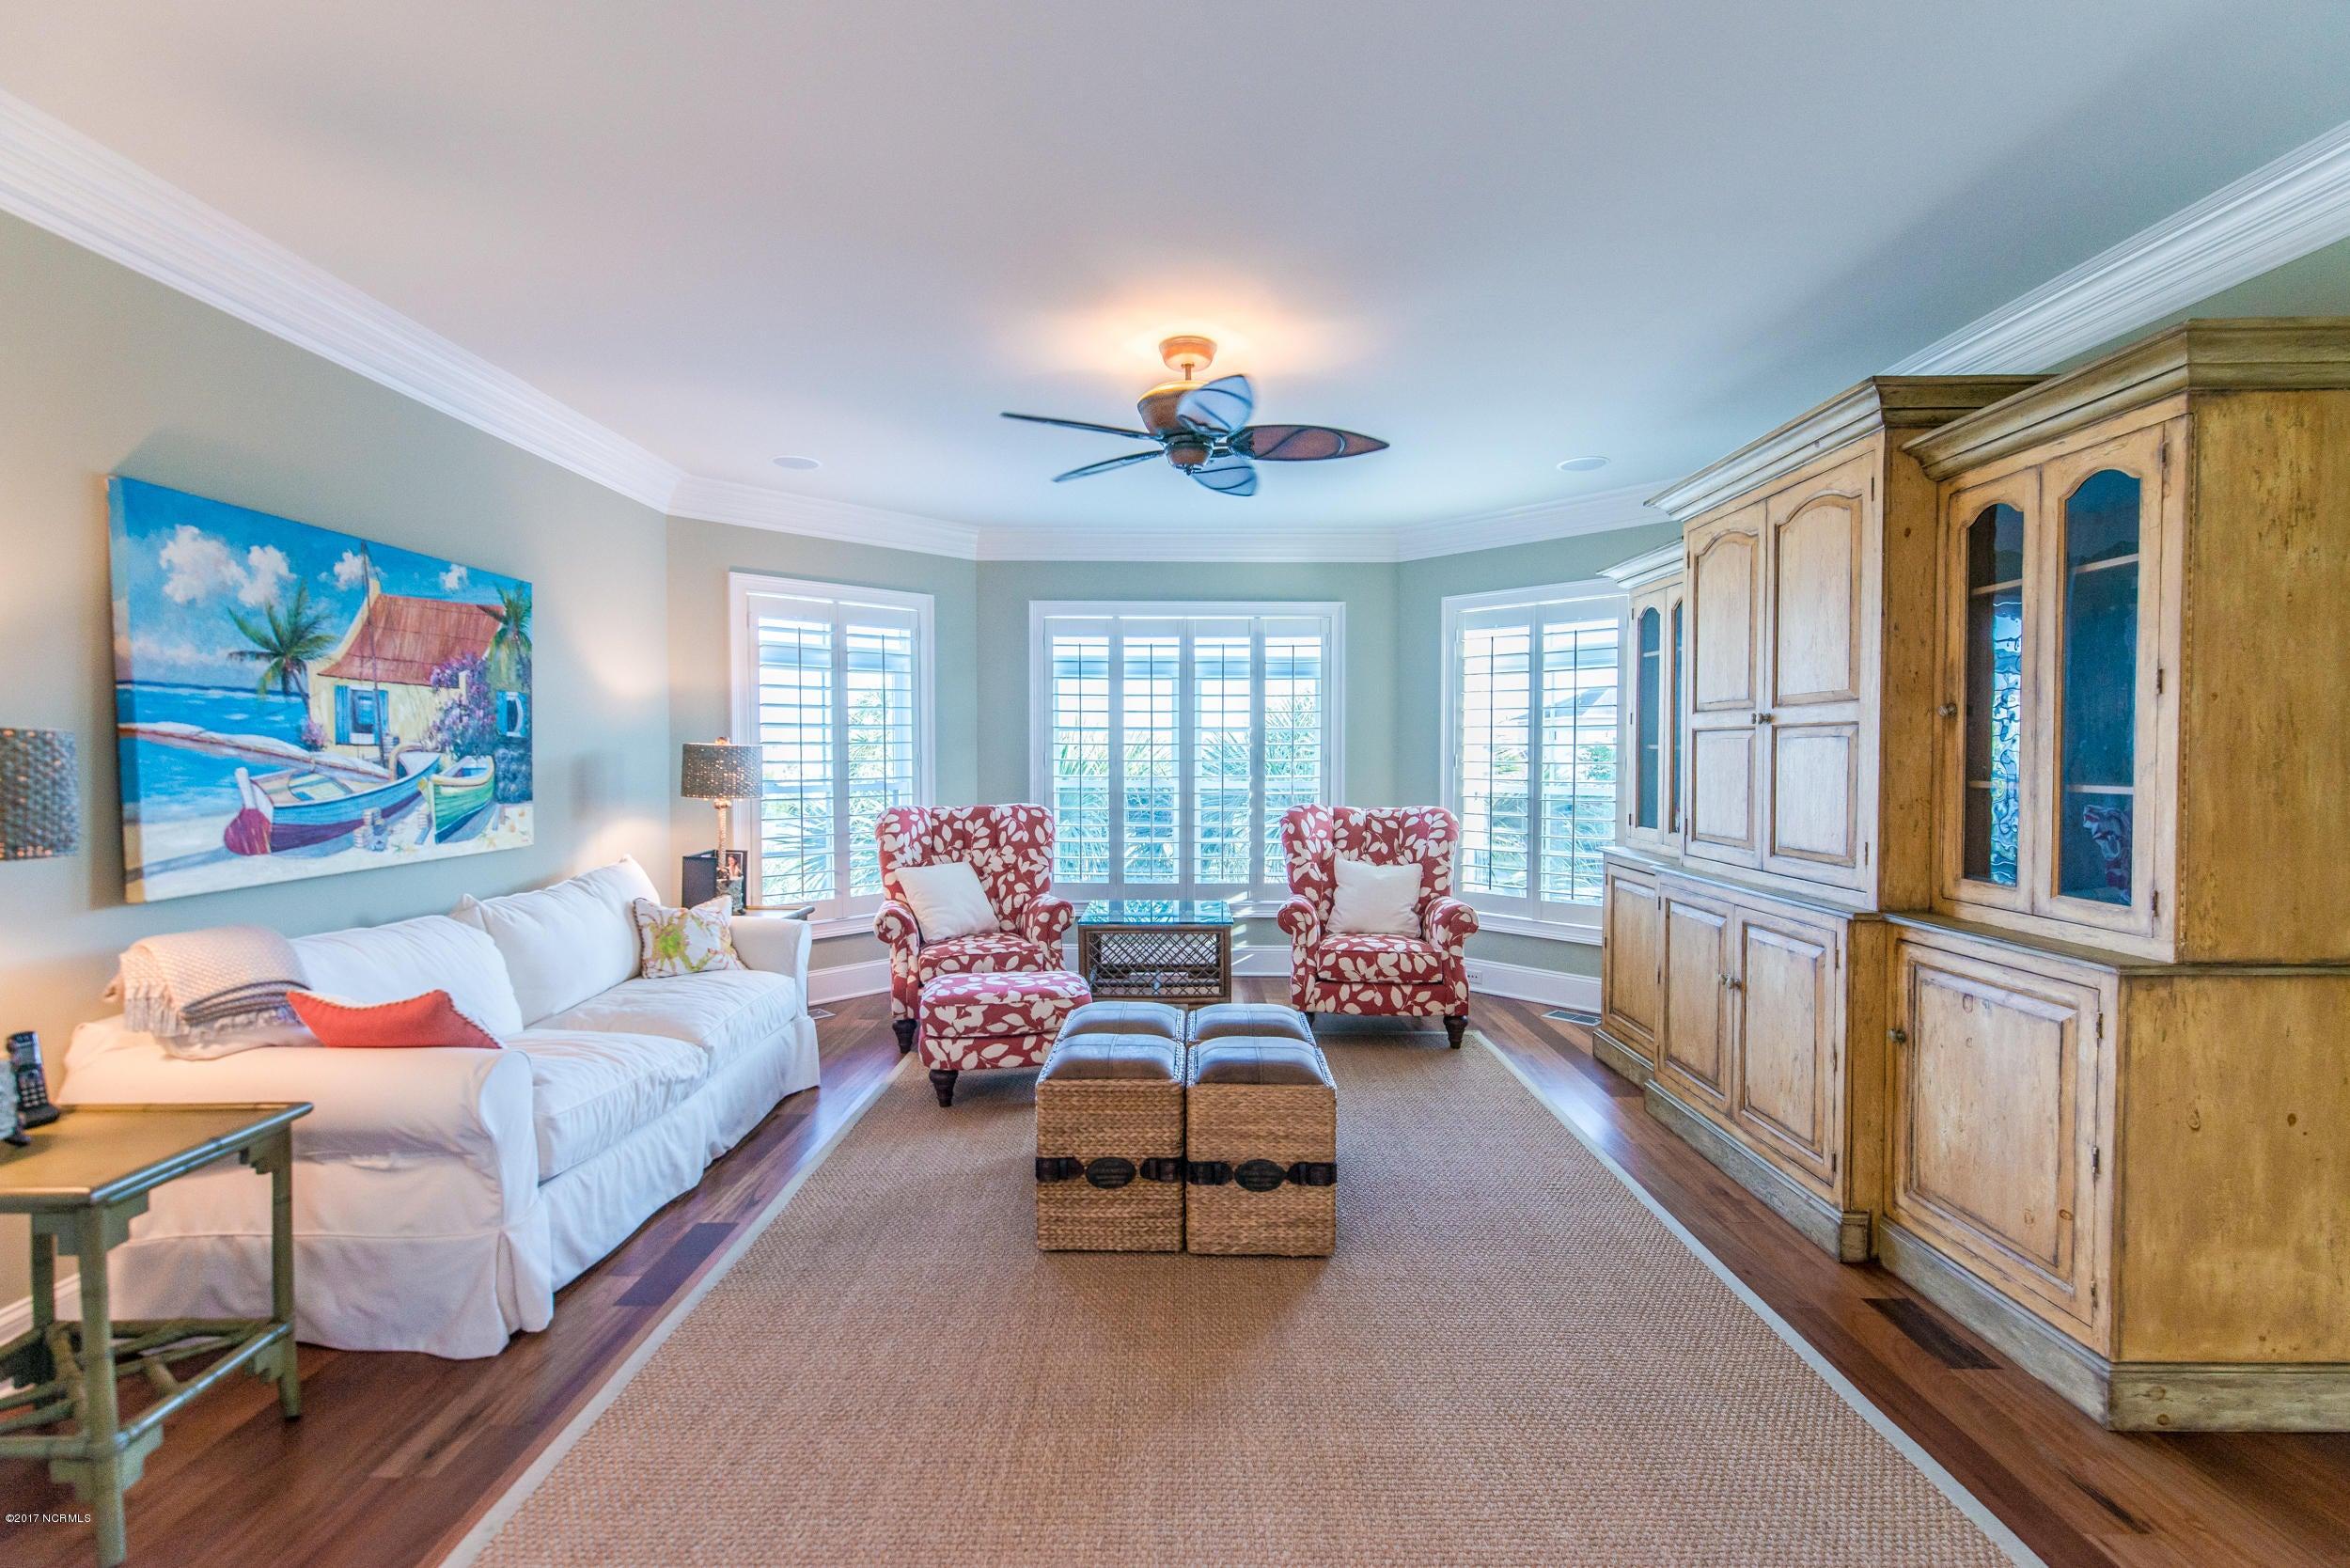 Ocean Isle Beach Real Estate - http://cdn.resize.sparkplatform.com/ncr/1024x768/true/20170829153329241107000000-o.jpg